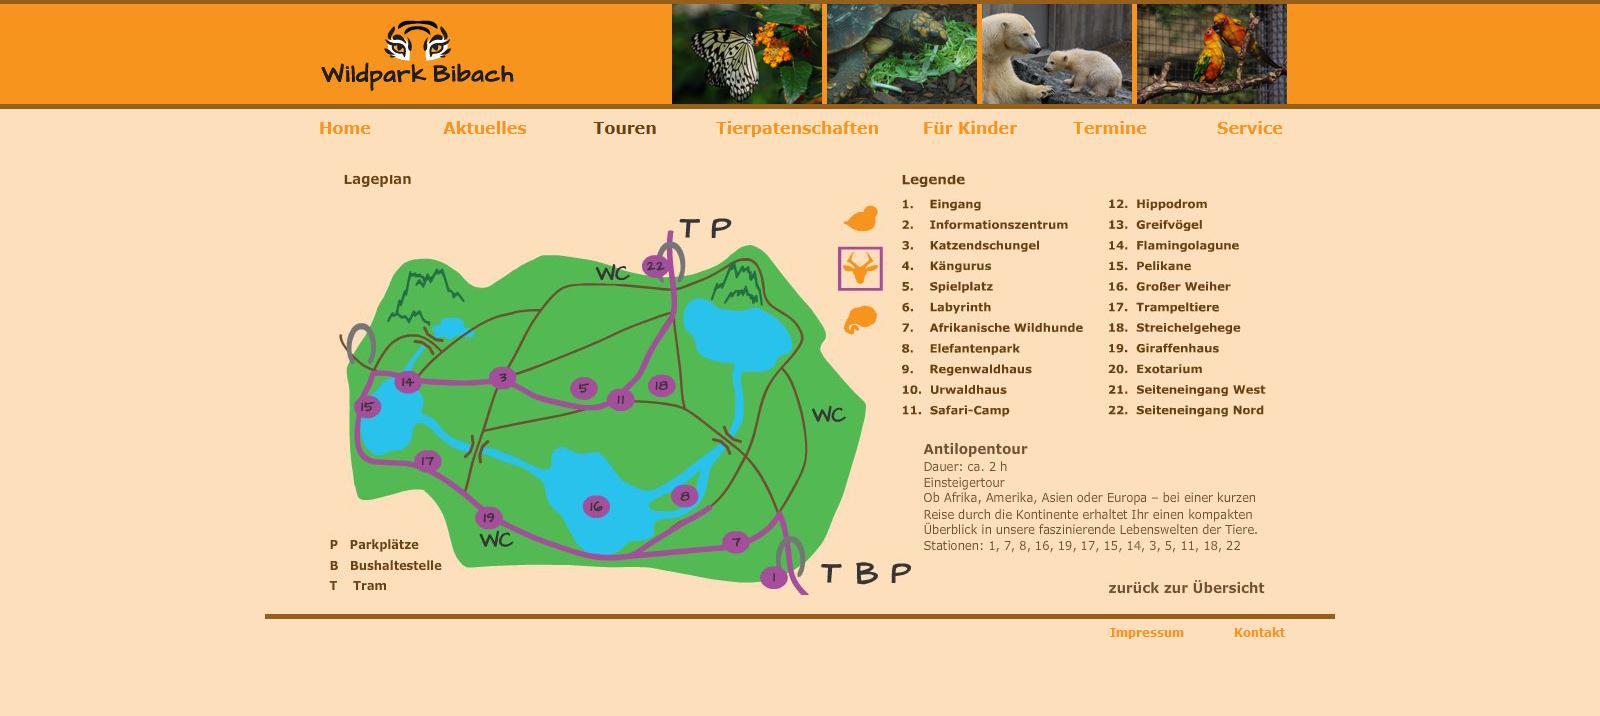 Wildpark Bibach - Antilopentour